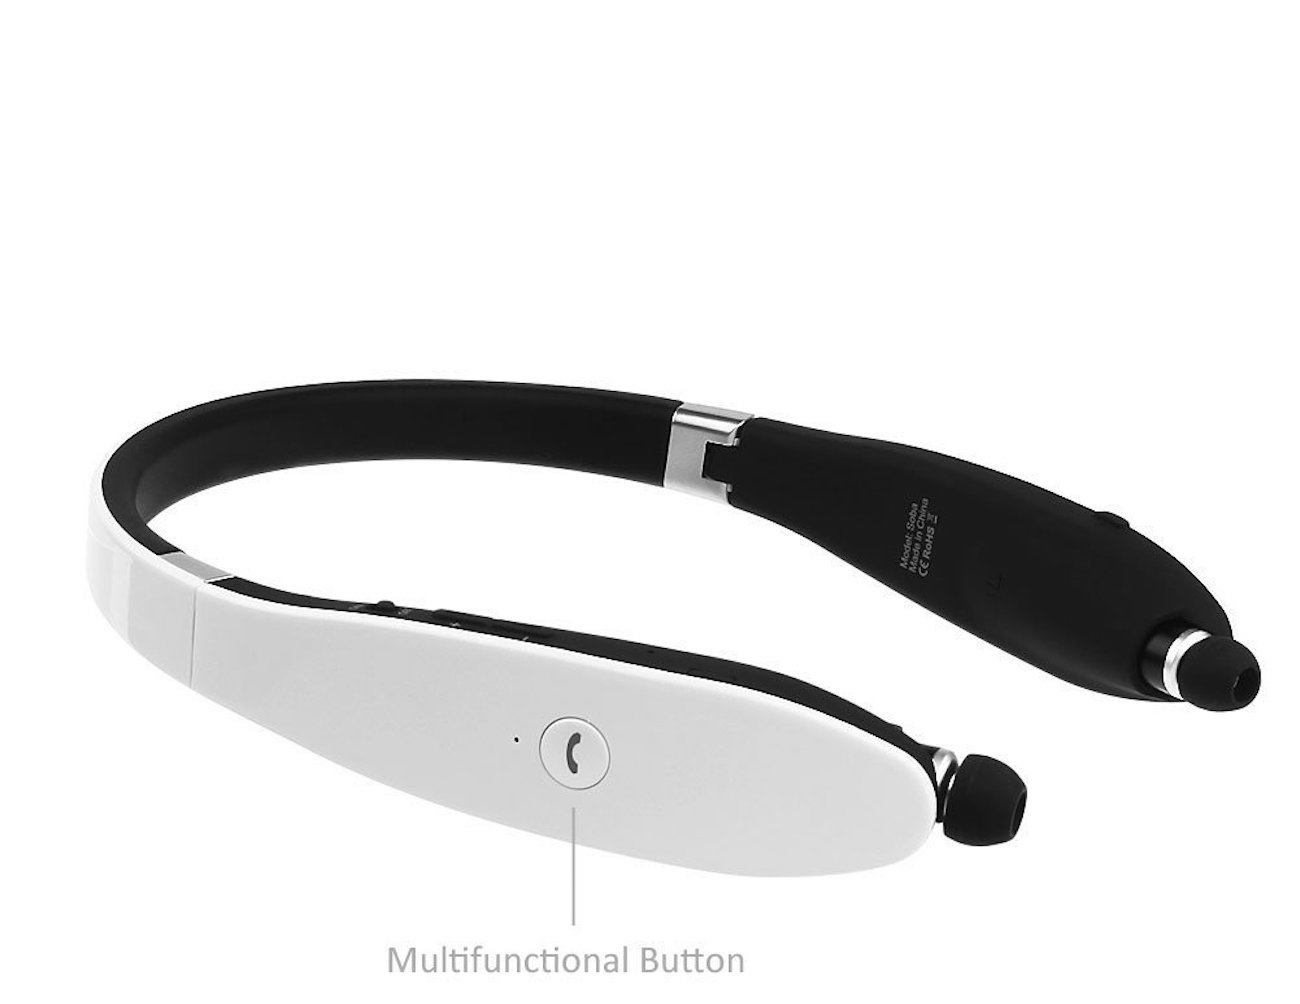 aLLreLi Bluetooth 4.0 Soba Retractable Wireless Stereo Headset